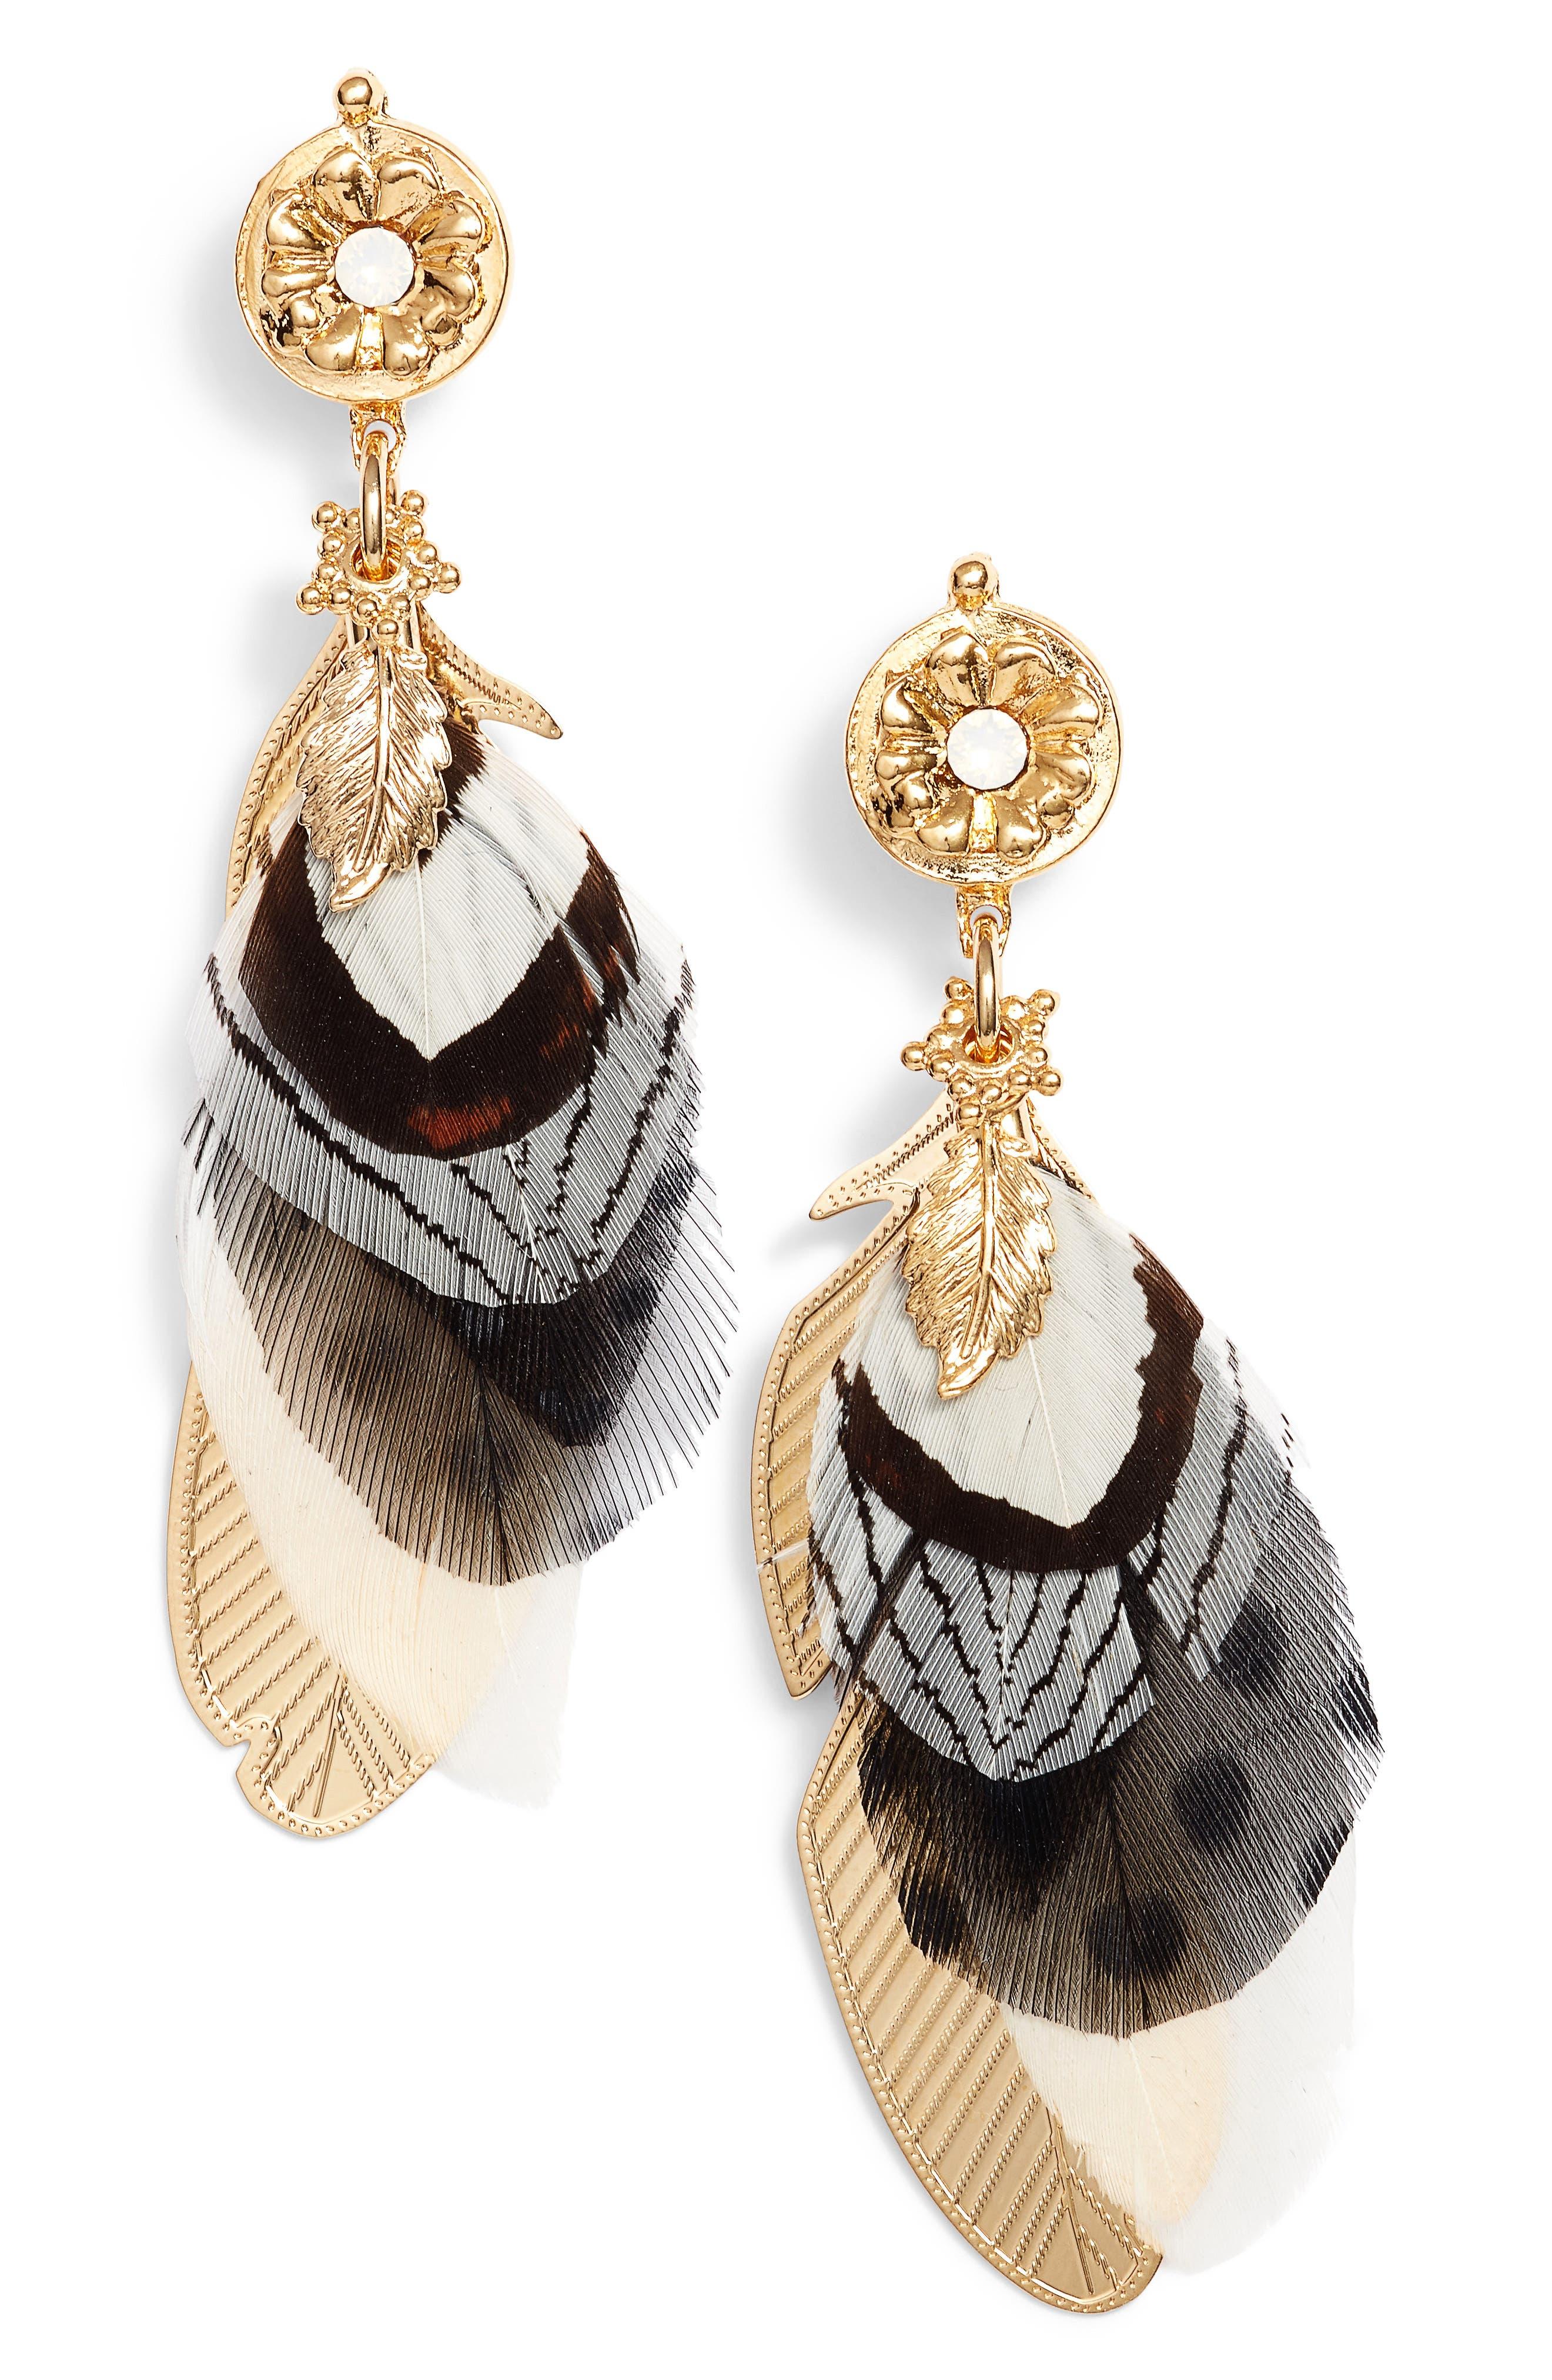 Small Sao Feather Earrings,                             Main thumbnail 1, color,                             010